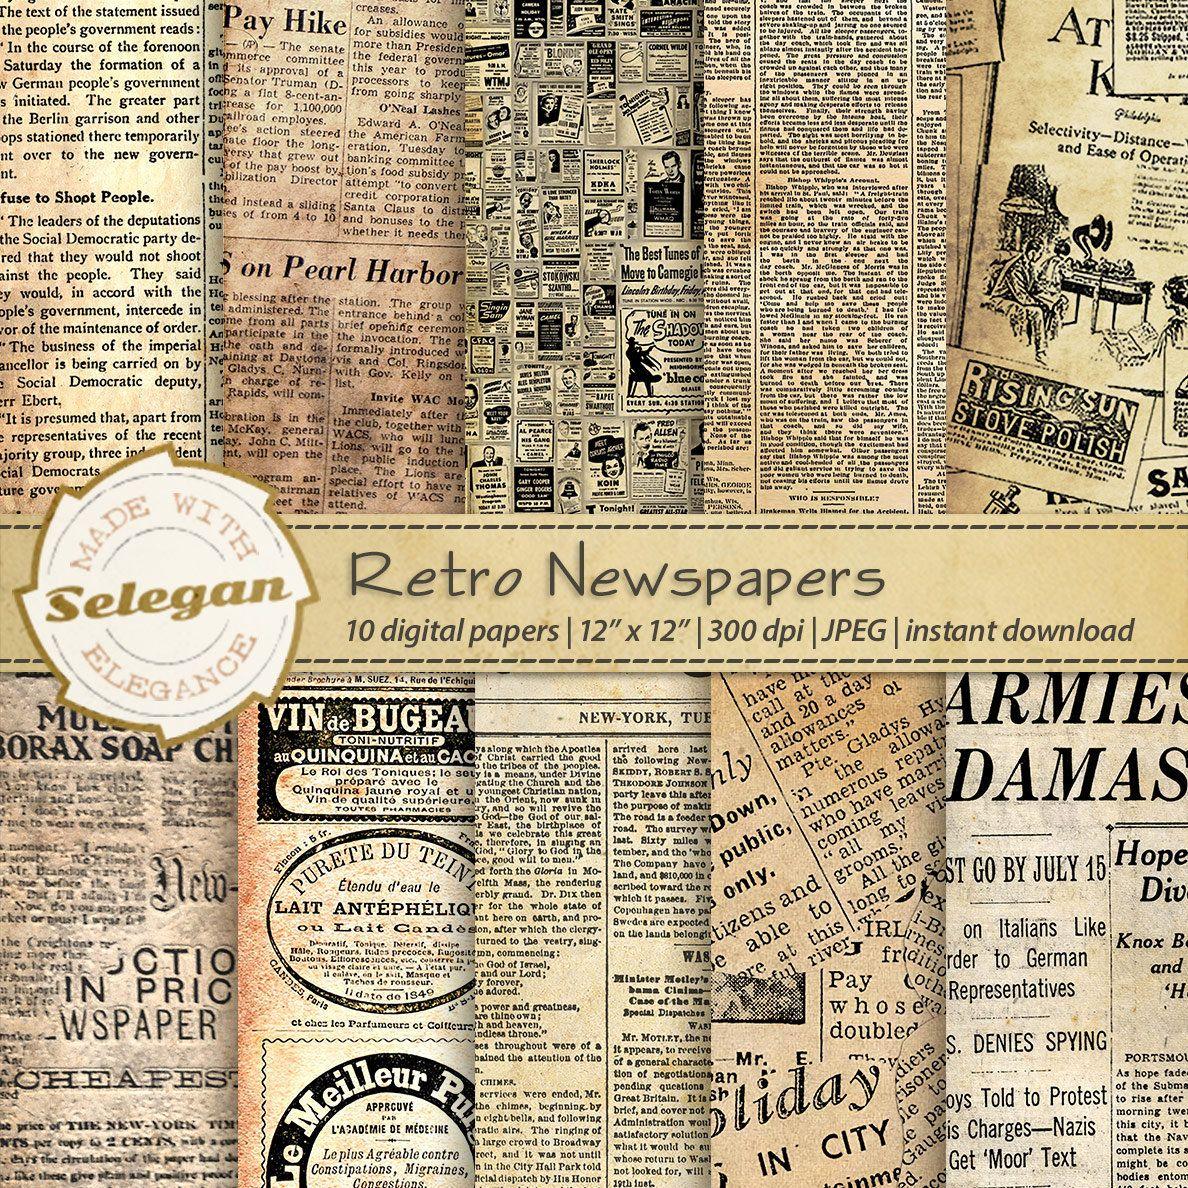 Retro Newspapers Antique Old Vintage Worn Classic News Paper Background Digital Newspaper Scrapbook Pack Grunge Textures Digital Newspaper Vintage Newspaper